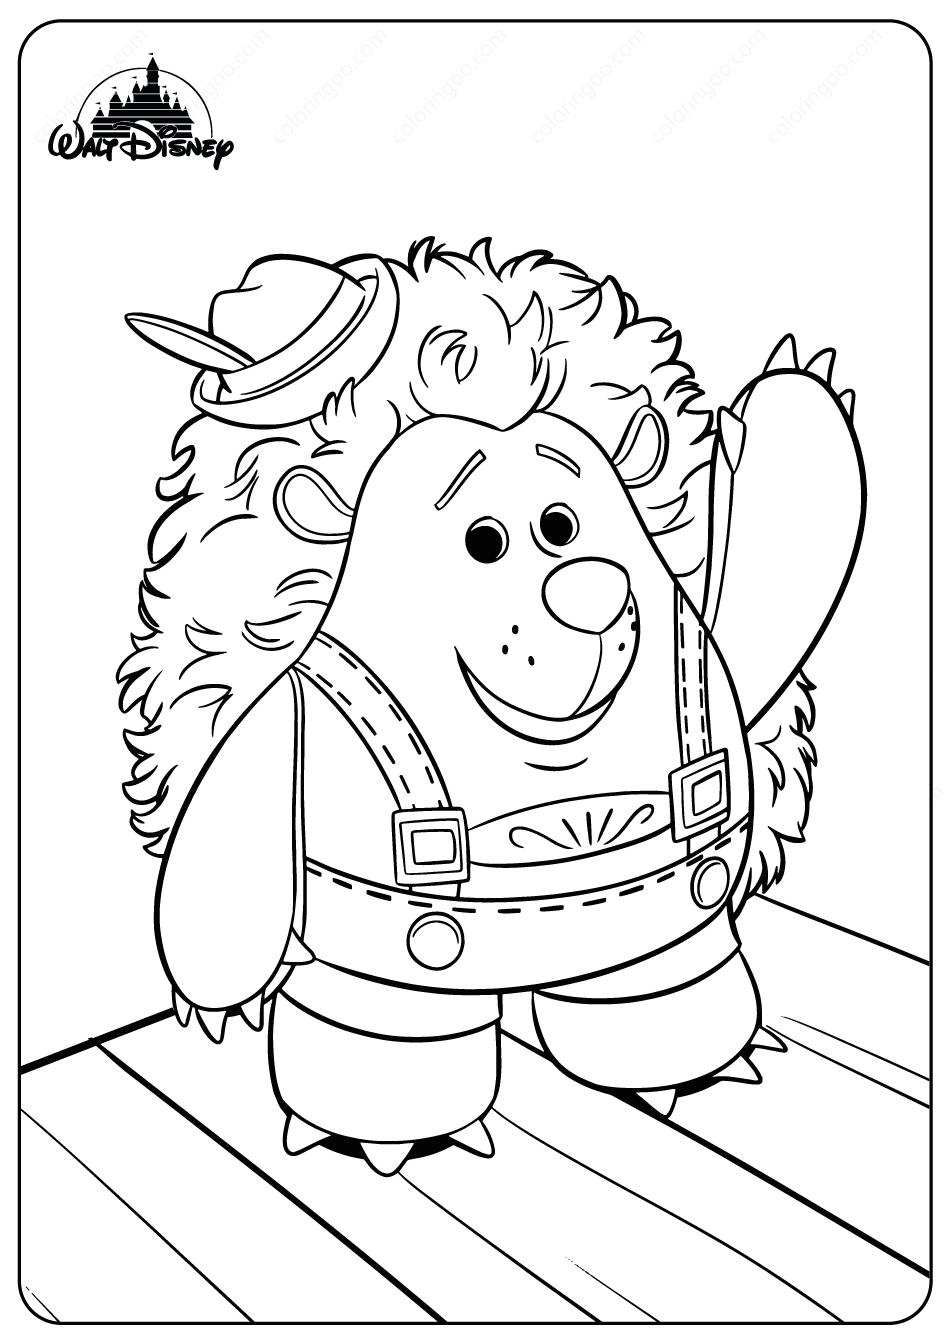 Disney Toy Story Mr Prinklepants Coloring Pages, 2020 ...